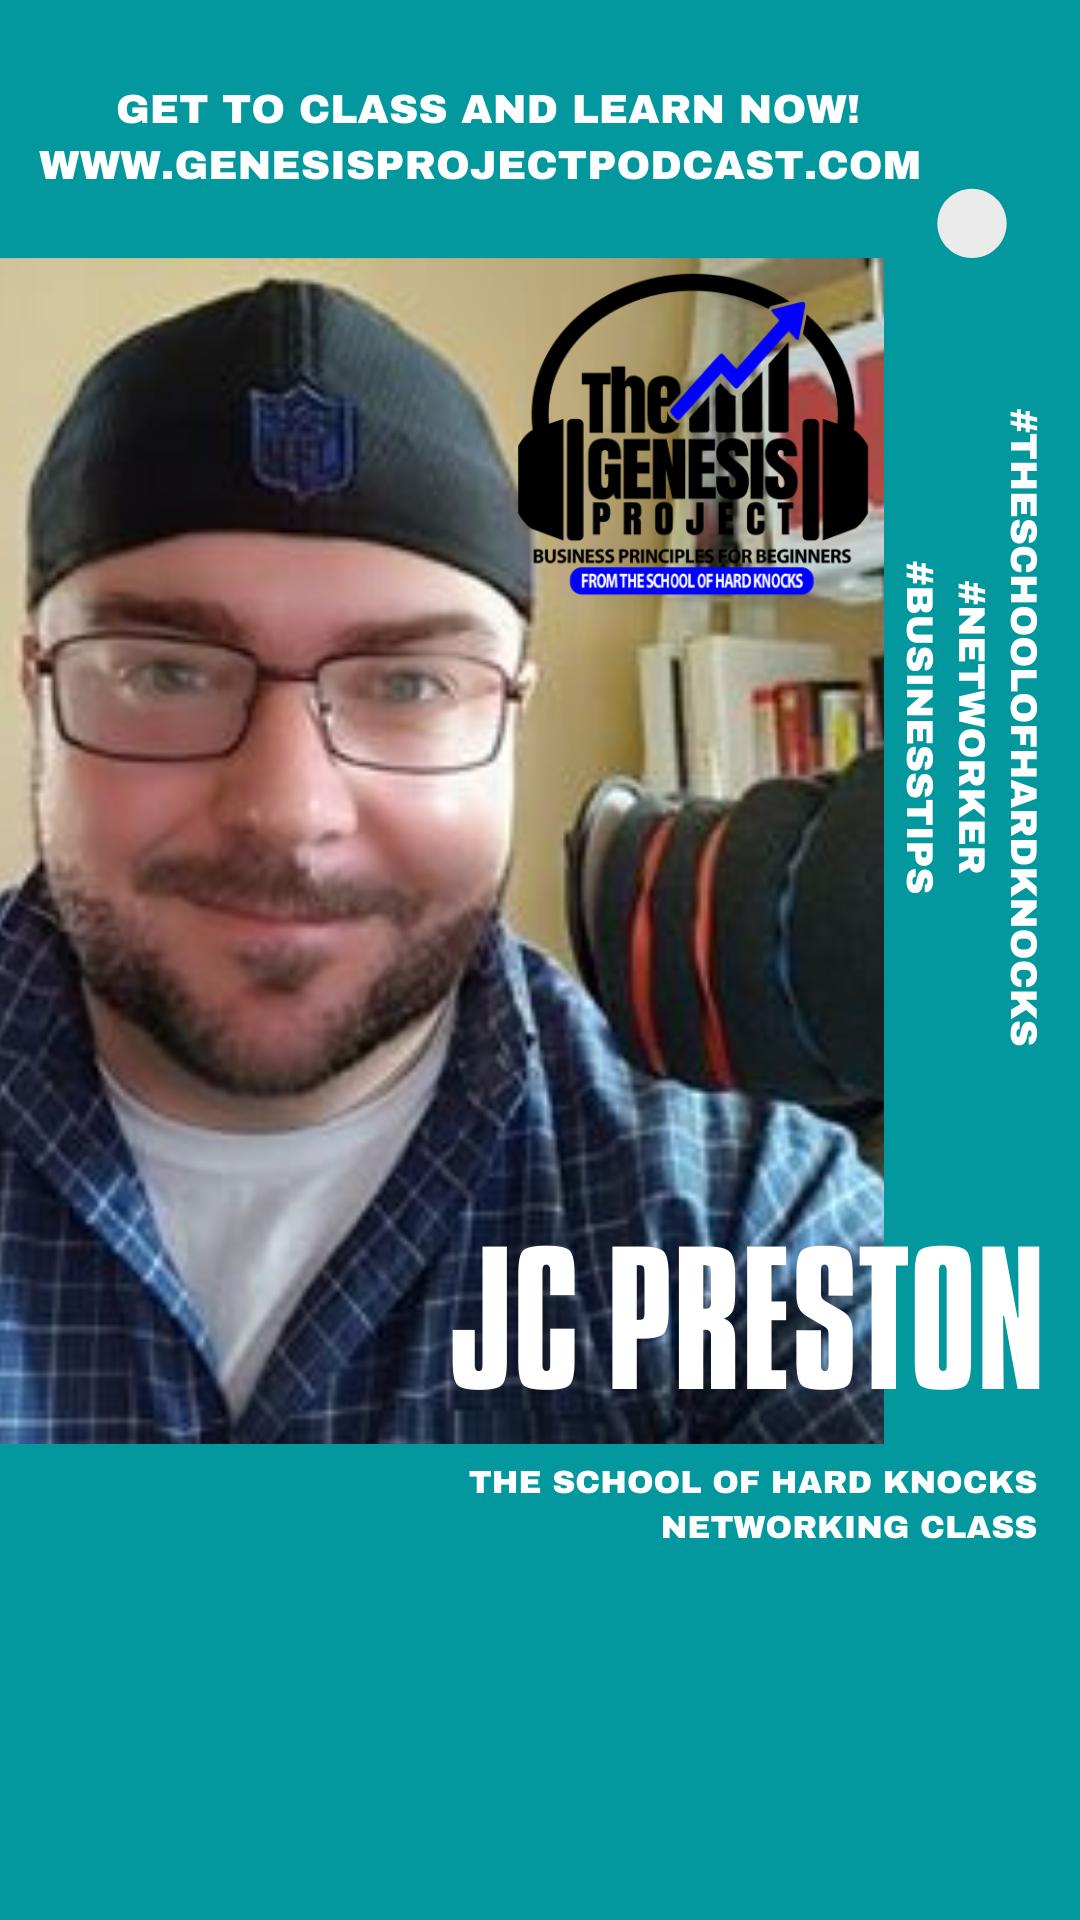 Guest professor JC Preston